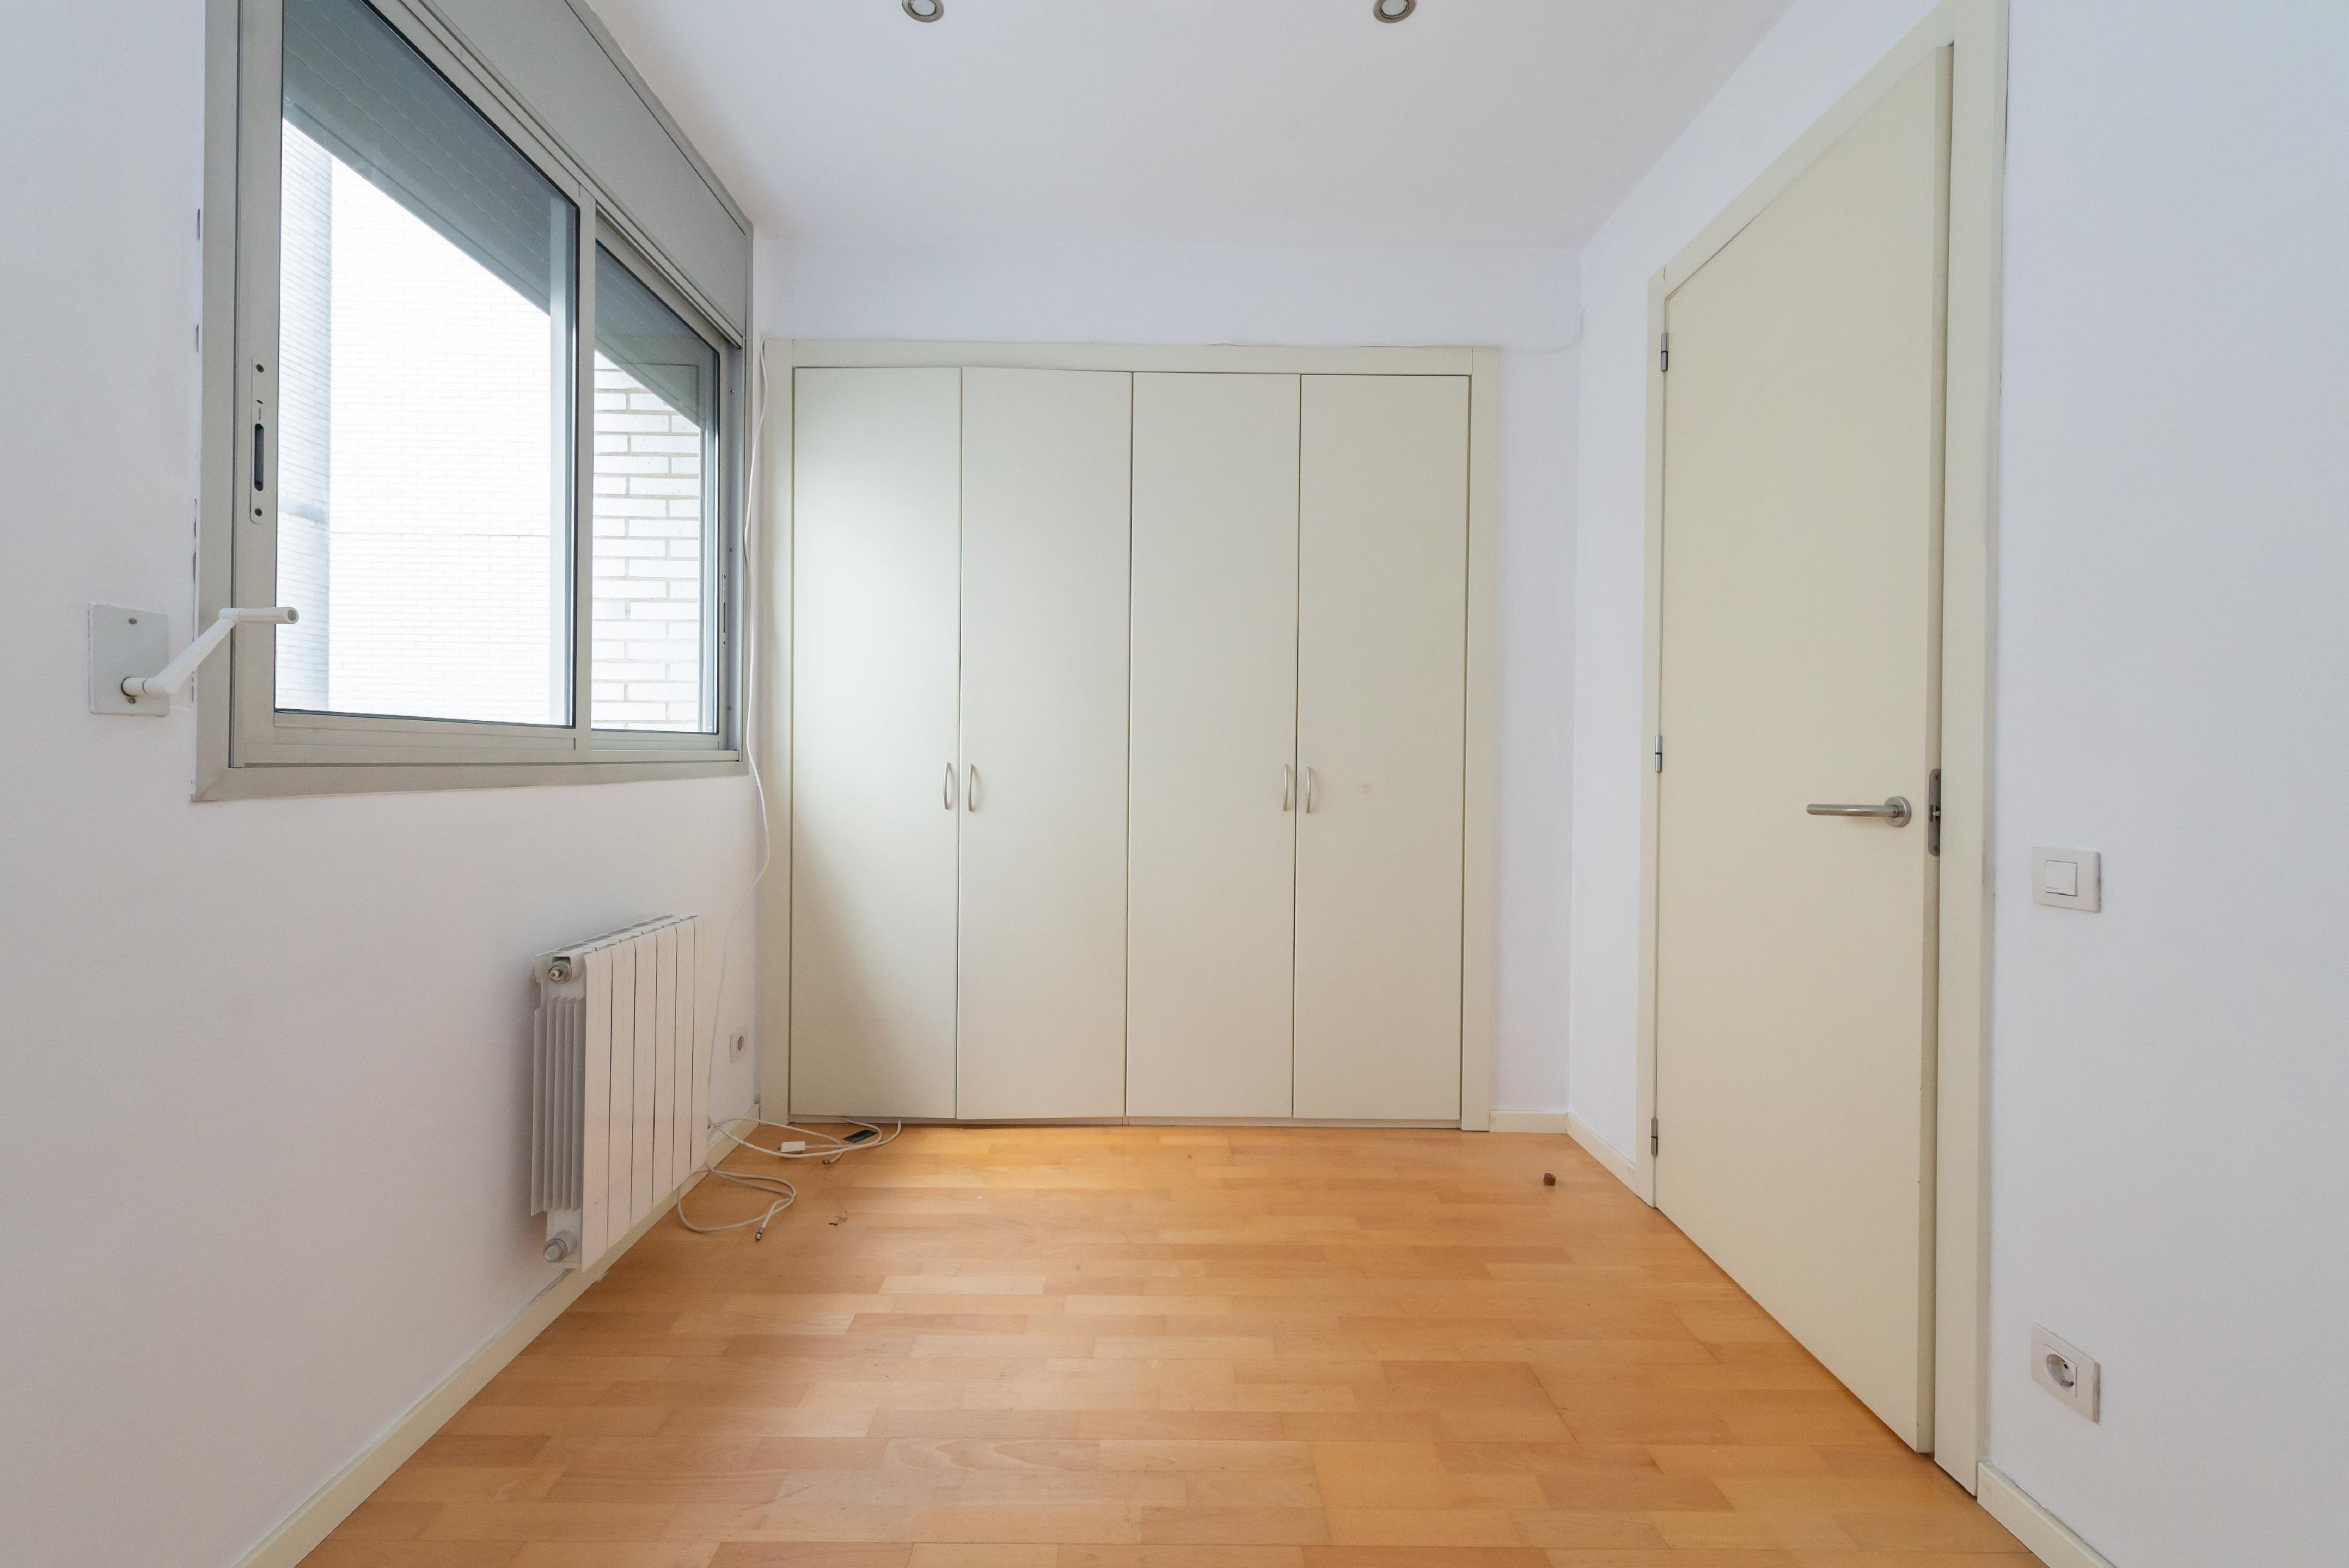 251446 Flat for sale in Sarrià-Sant Gervasi, Tres Torres 26